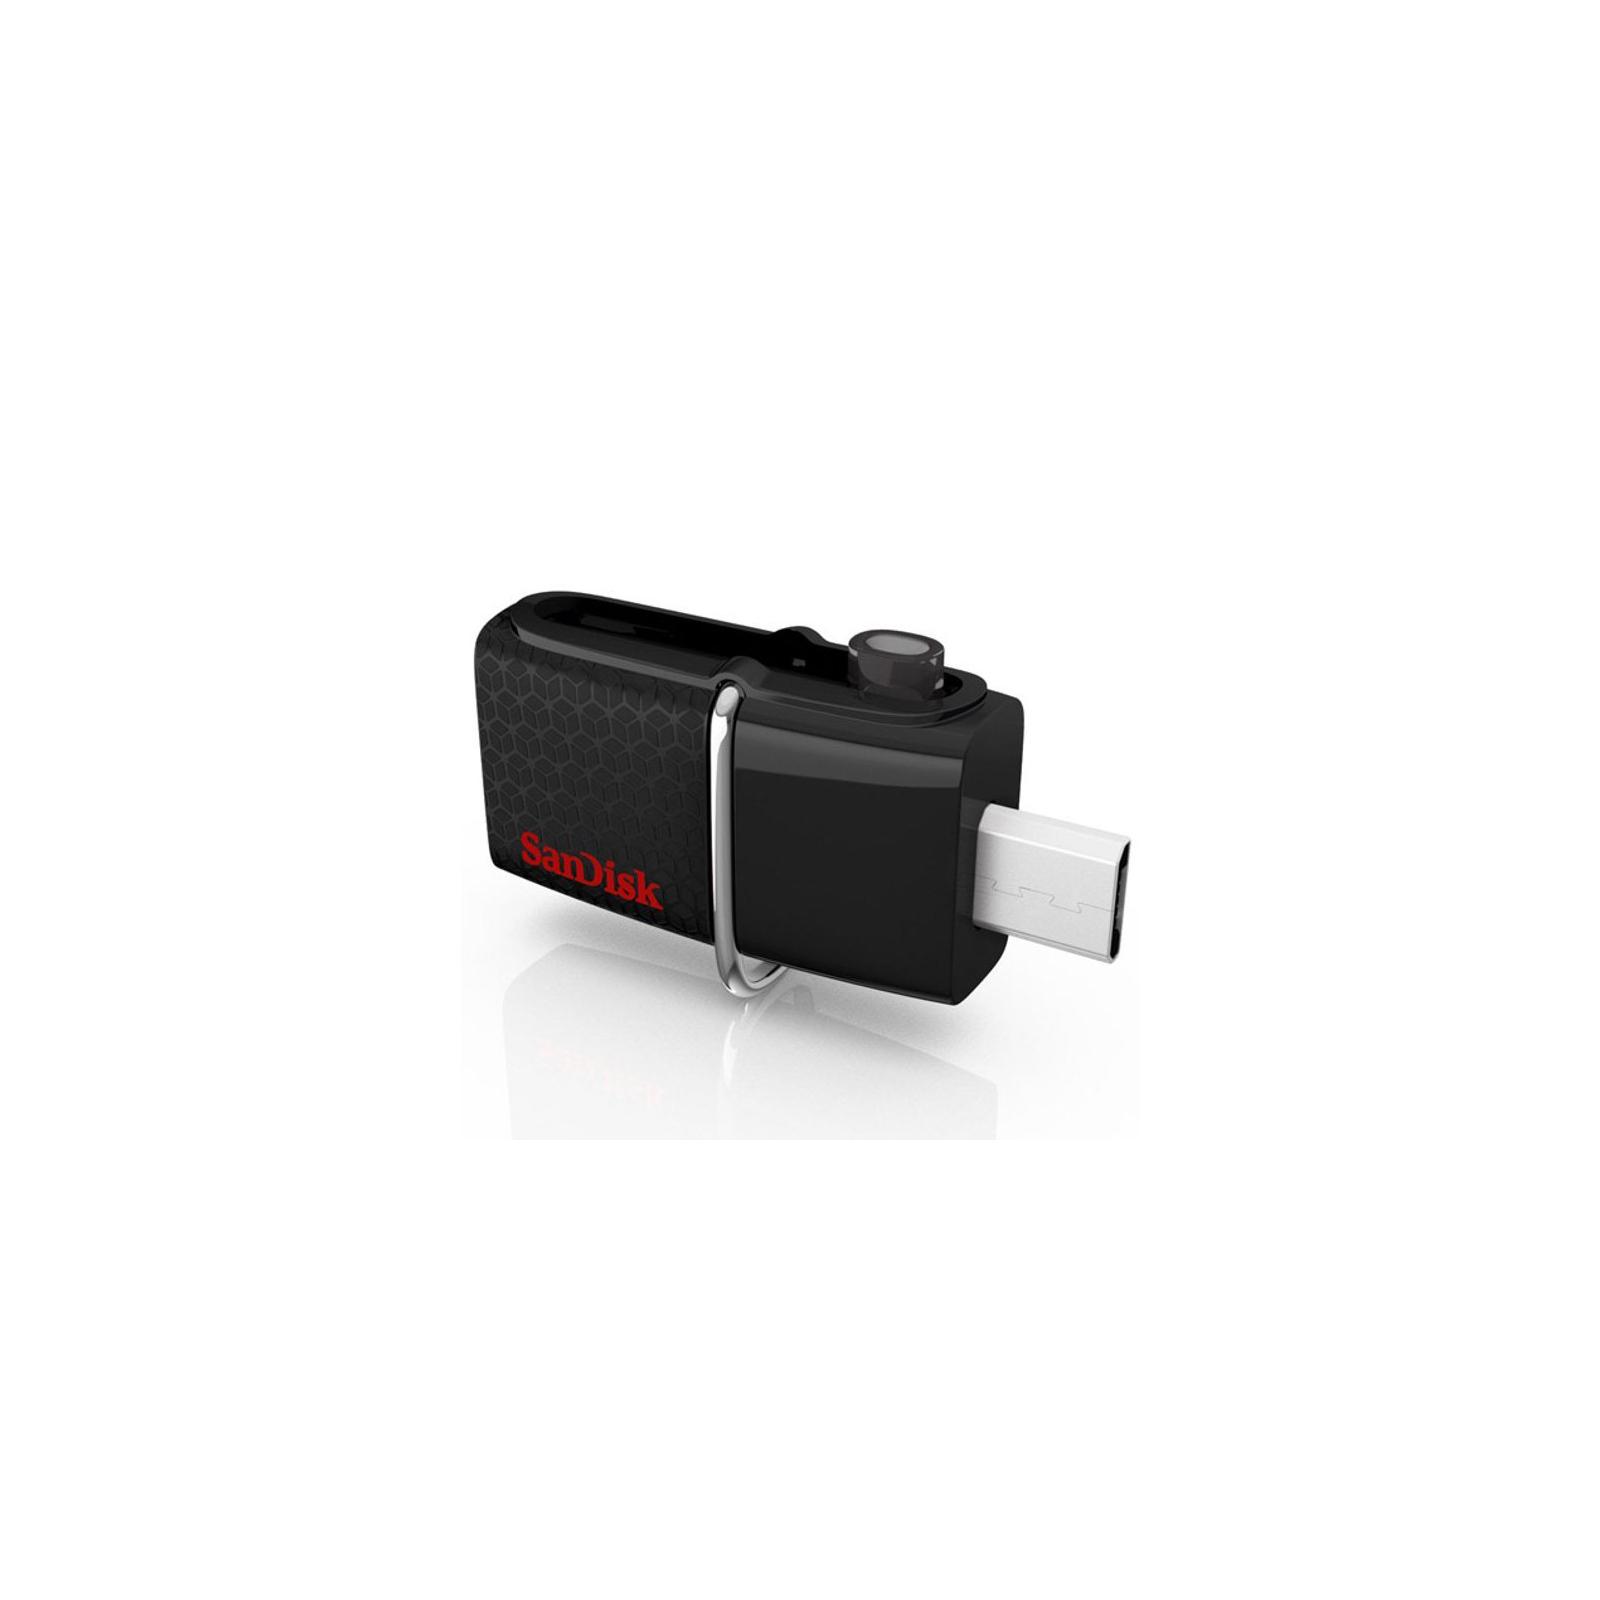 USB флеш накопитель SanDisk 32GB Ultra Dual Drive m3.0 White-Gold USB 3.0/OTG (SDDD3-032G-G46GW) изображение 6